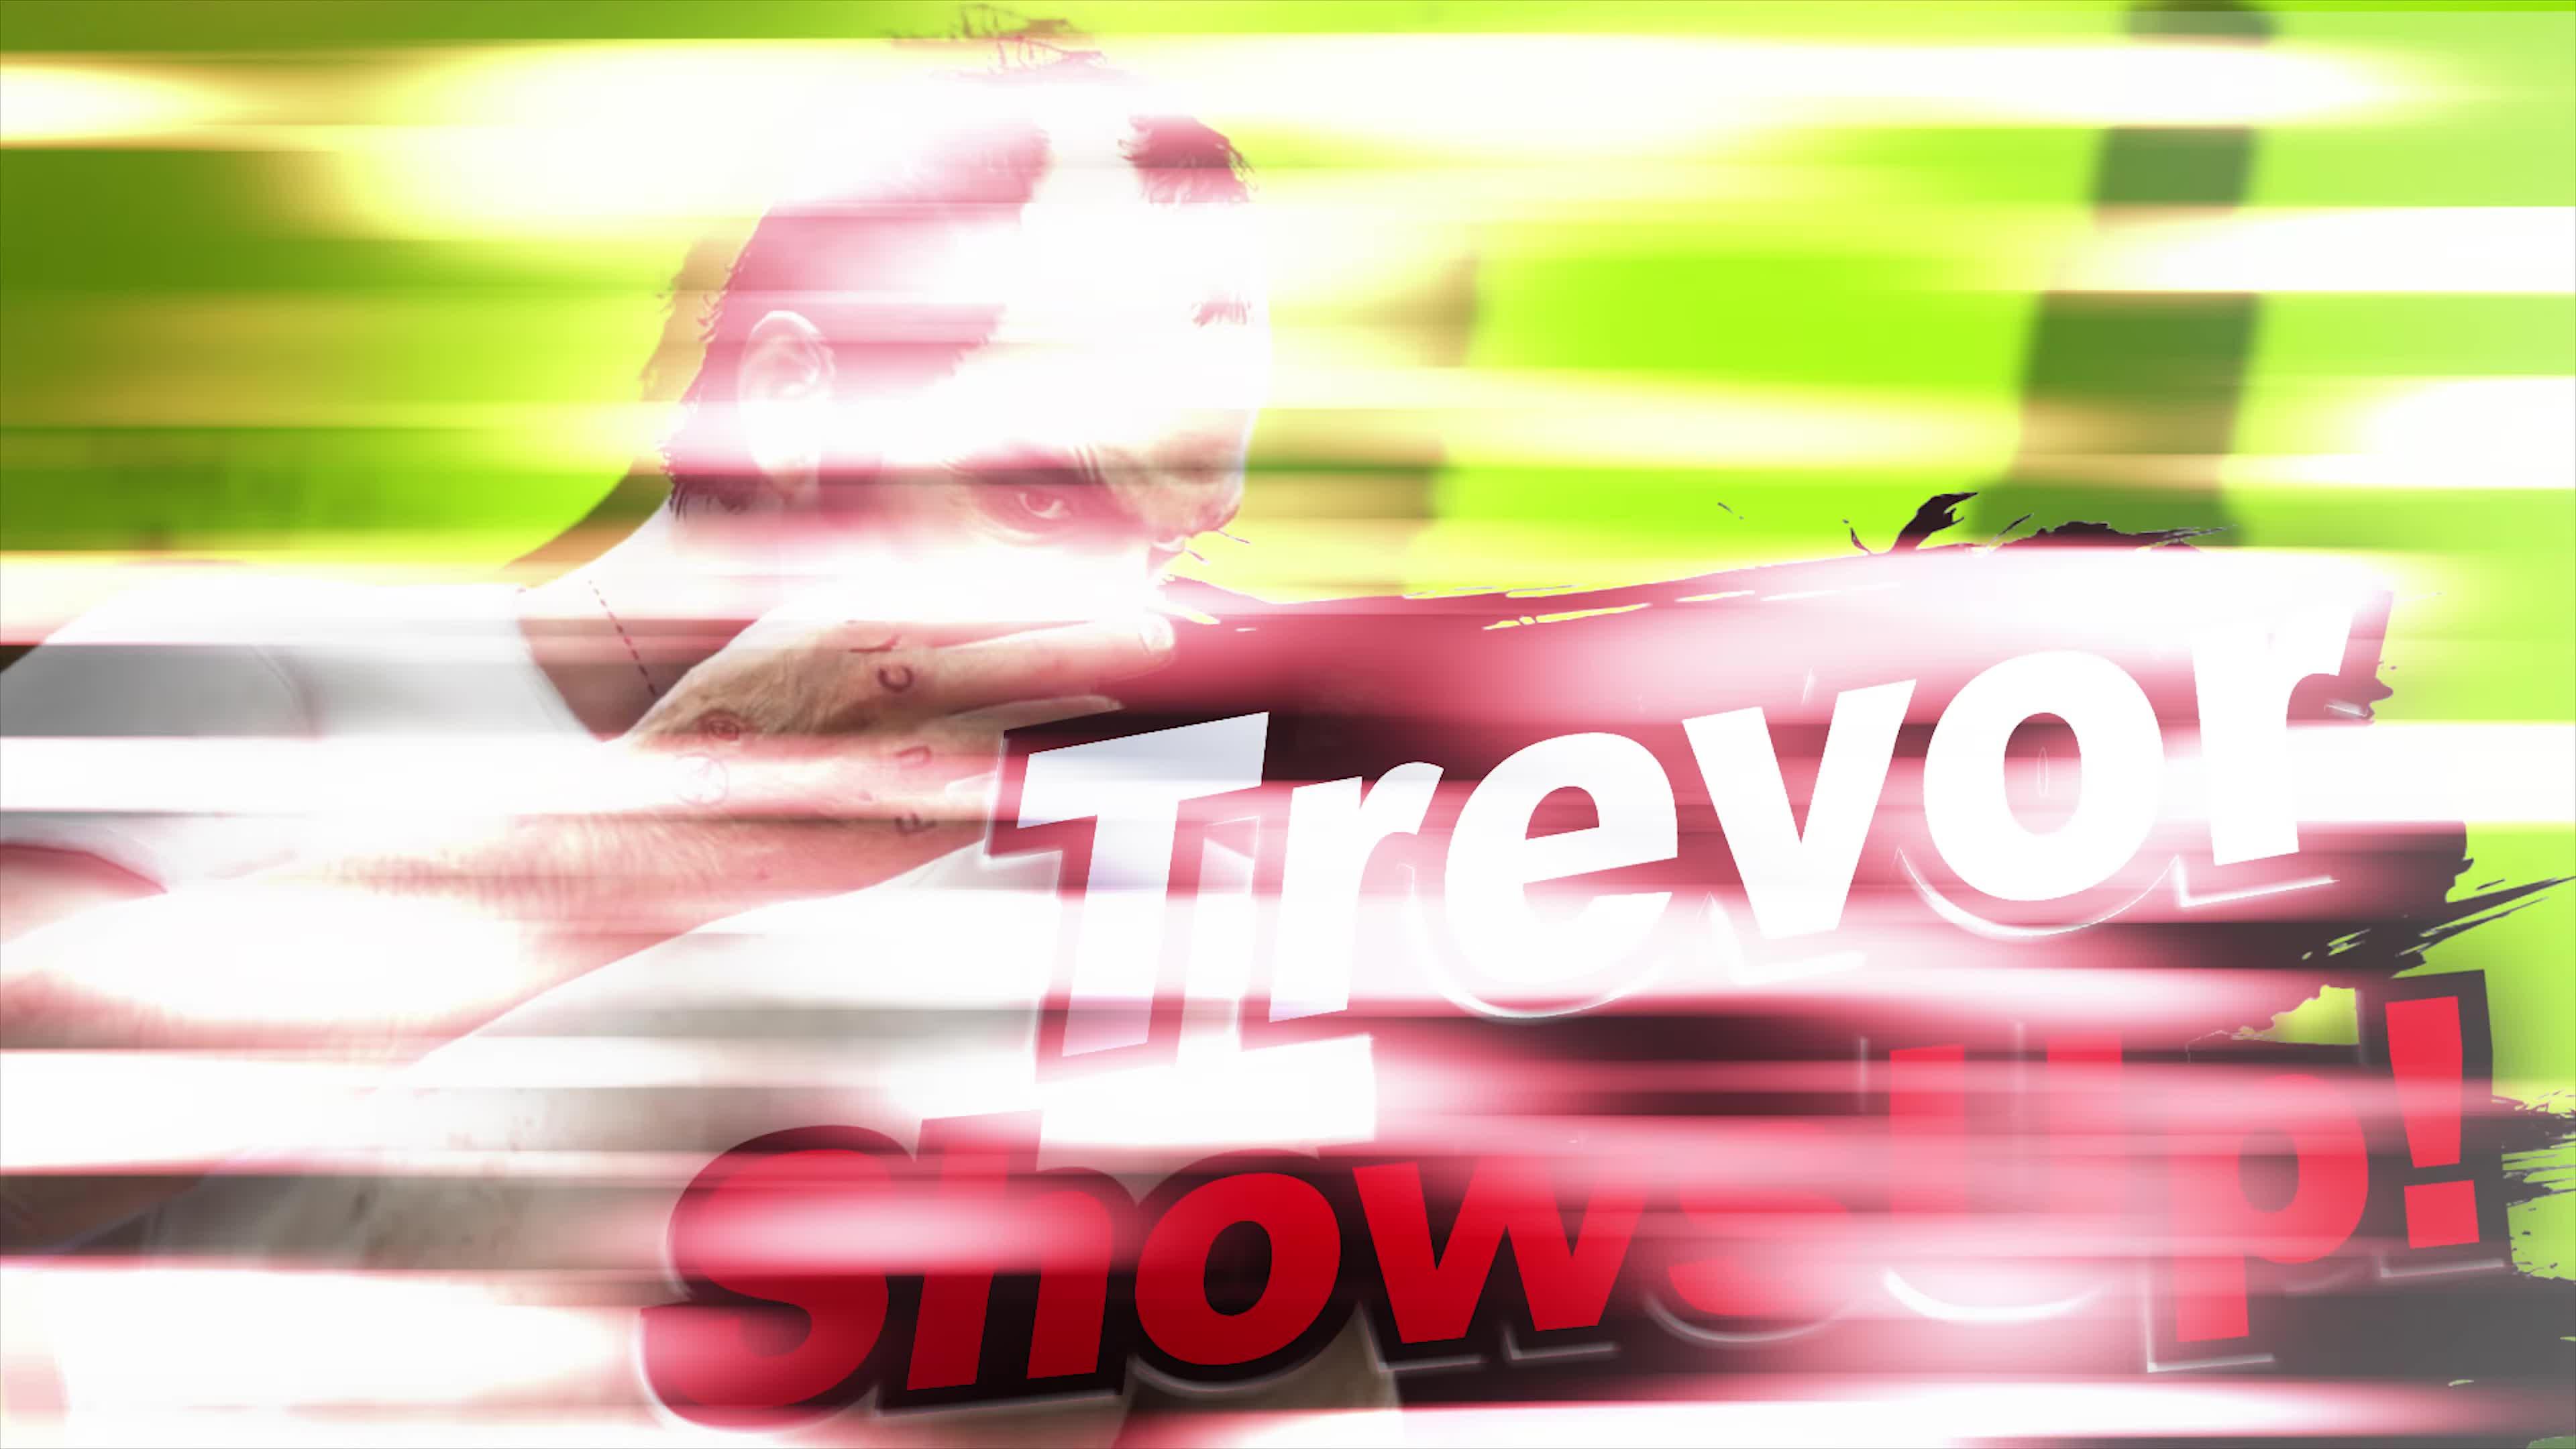 Meme, Nintendo, Nintendo Switch, Smash Bros, Smash Bros Ultimate, Super Smash Bros., Super Smash Brothers, Super Smash Brothers Ultimate, Trevor Philips, super smash bros ultimate, TREVOR PHILIPS JOINS THE BATTLE | Super Smash Bros. Ultimate | Nintendo Direct 2018 [GTA V] GIFs